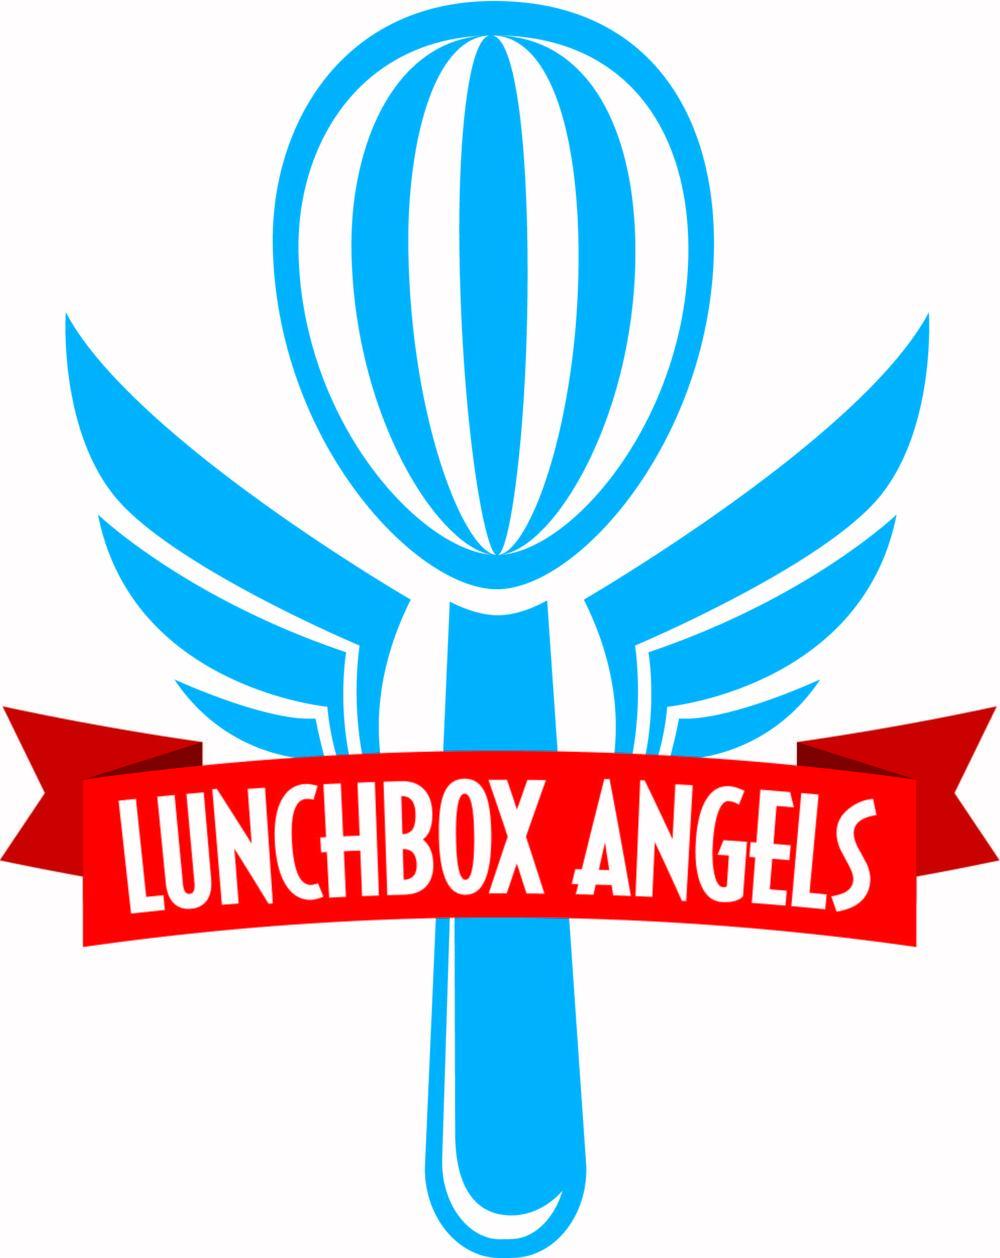 LunchboxAngels_LOGO